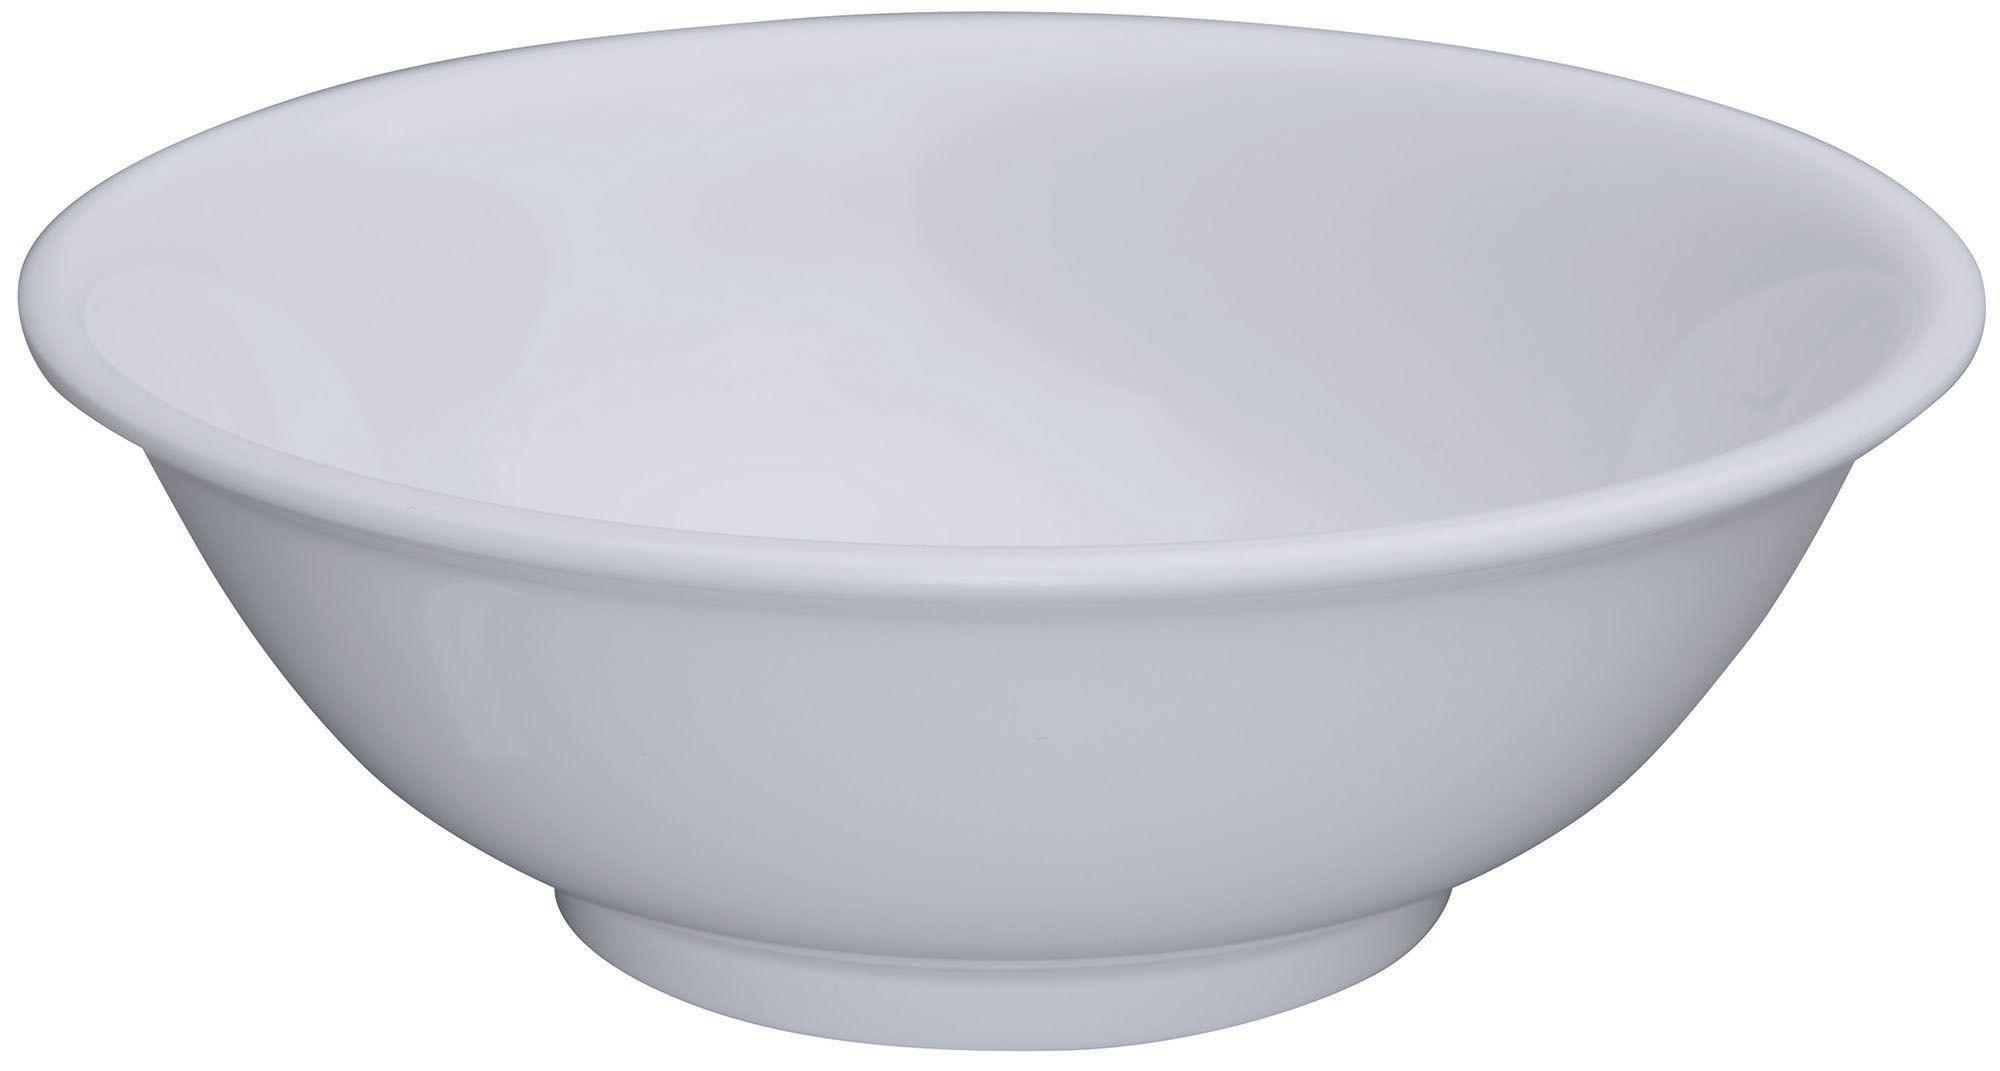 Winco MMB-32W White Melamine Rimless Bowl 32 oz.